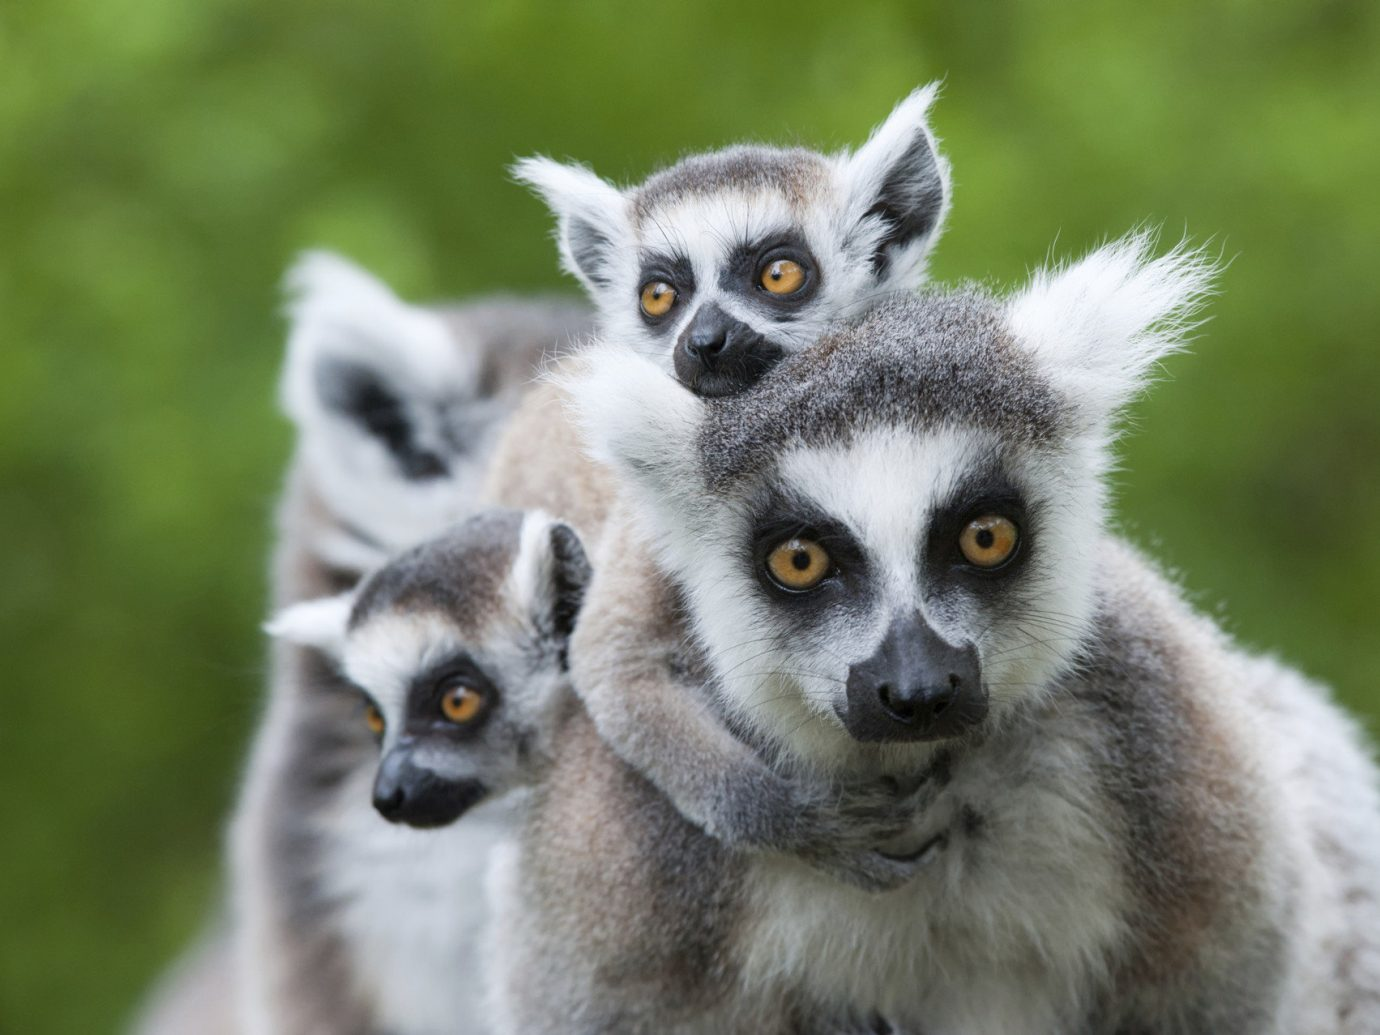 Trip Ideas mammal animal lemur vertebrate primate Wildlife fauna langur squirrel monkey pygmy slow loris new world monkey close bassarisk